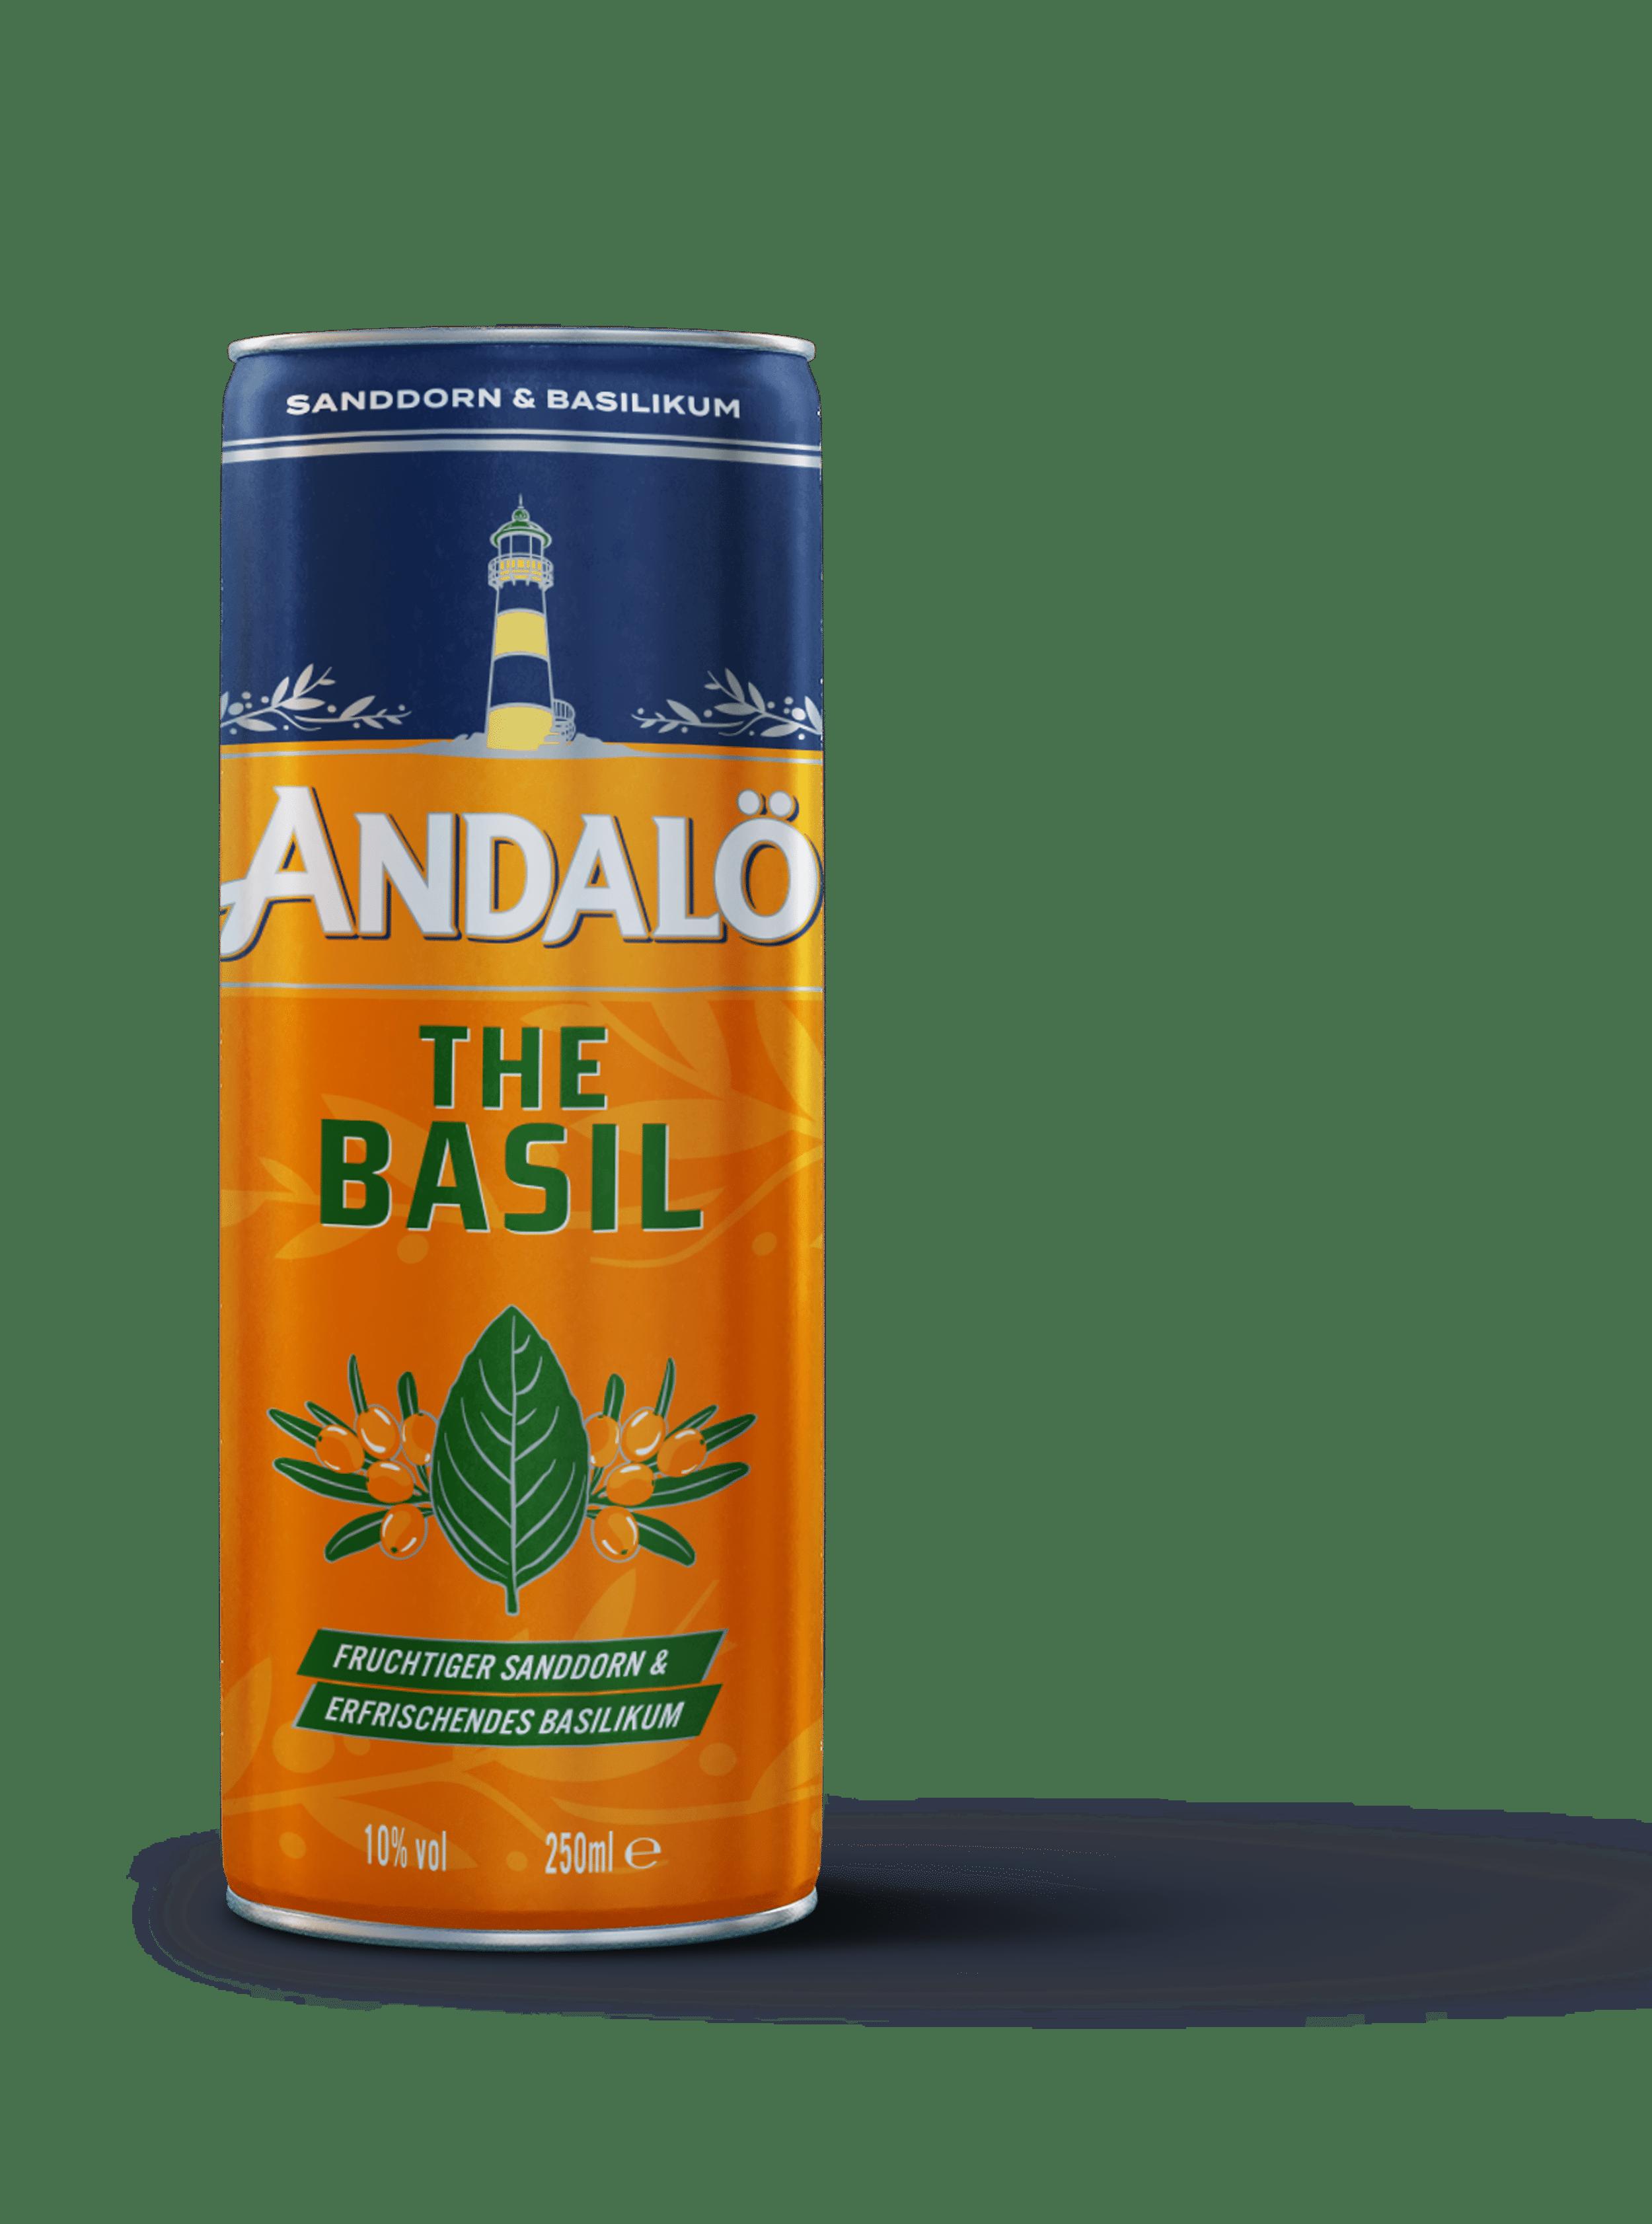 NEU: ANDALÖ THE BASIL